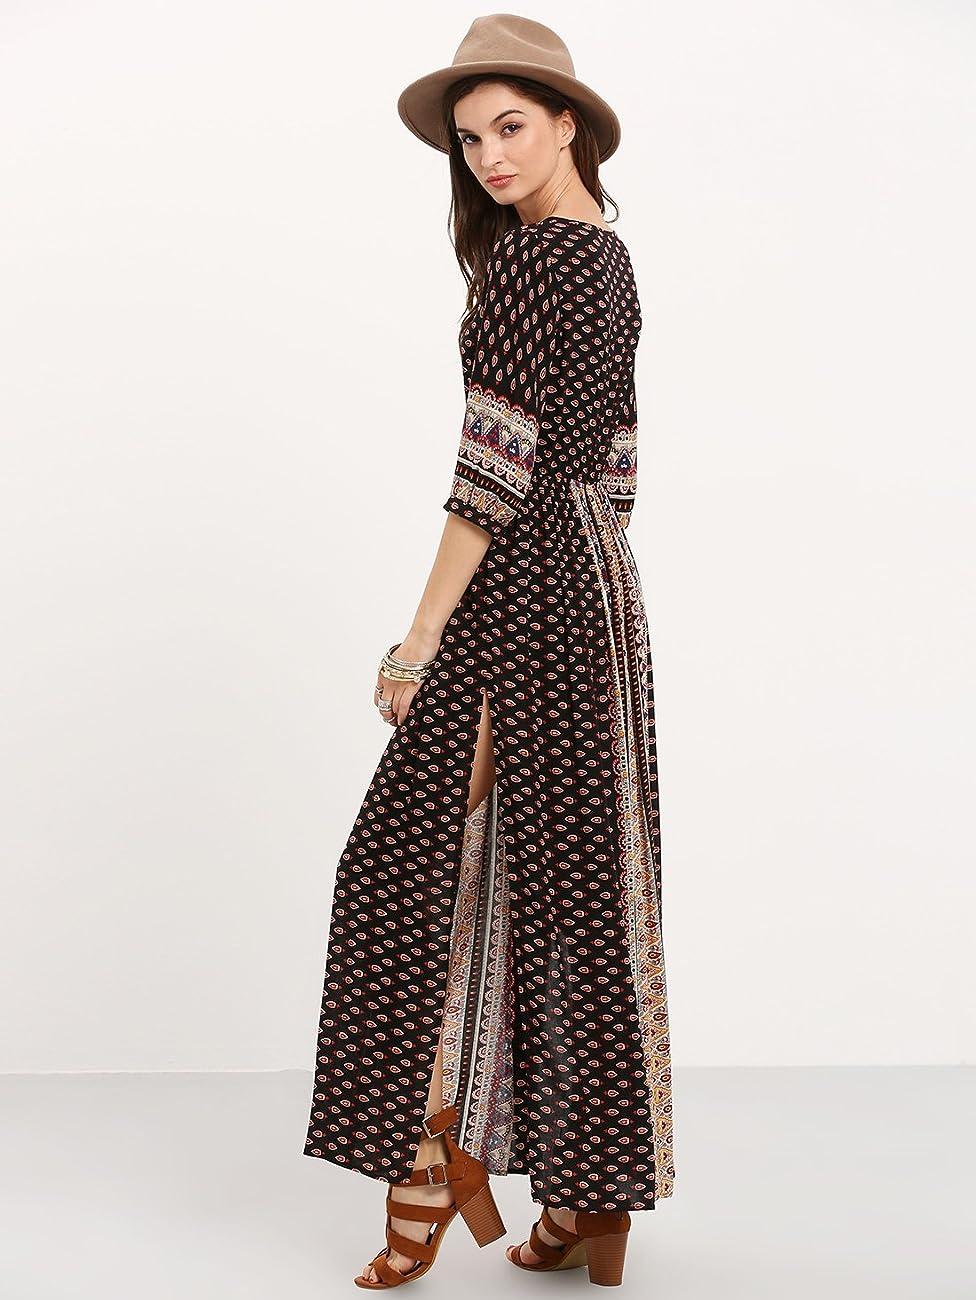 ROMWE Women's Summer Casual Half Sleeve Vintage Print Split Maxi Dress 3